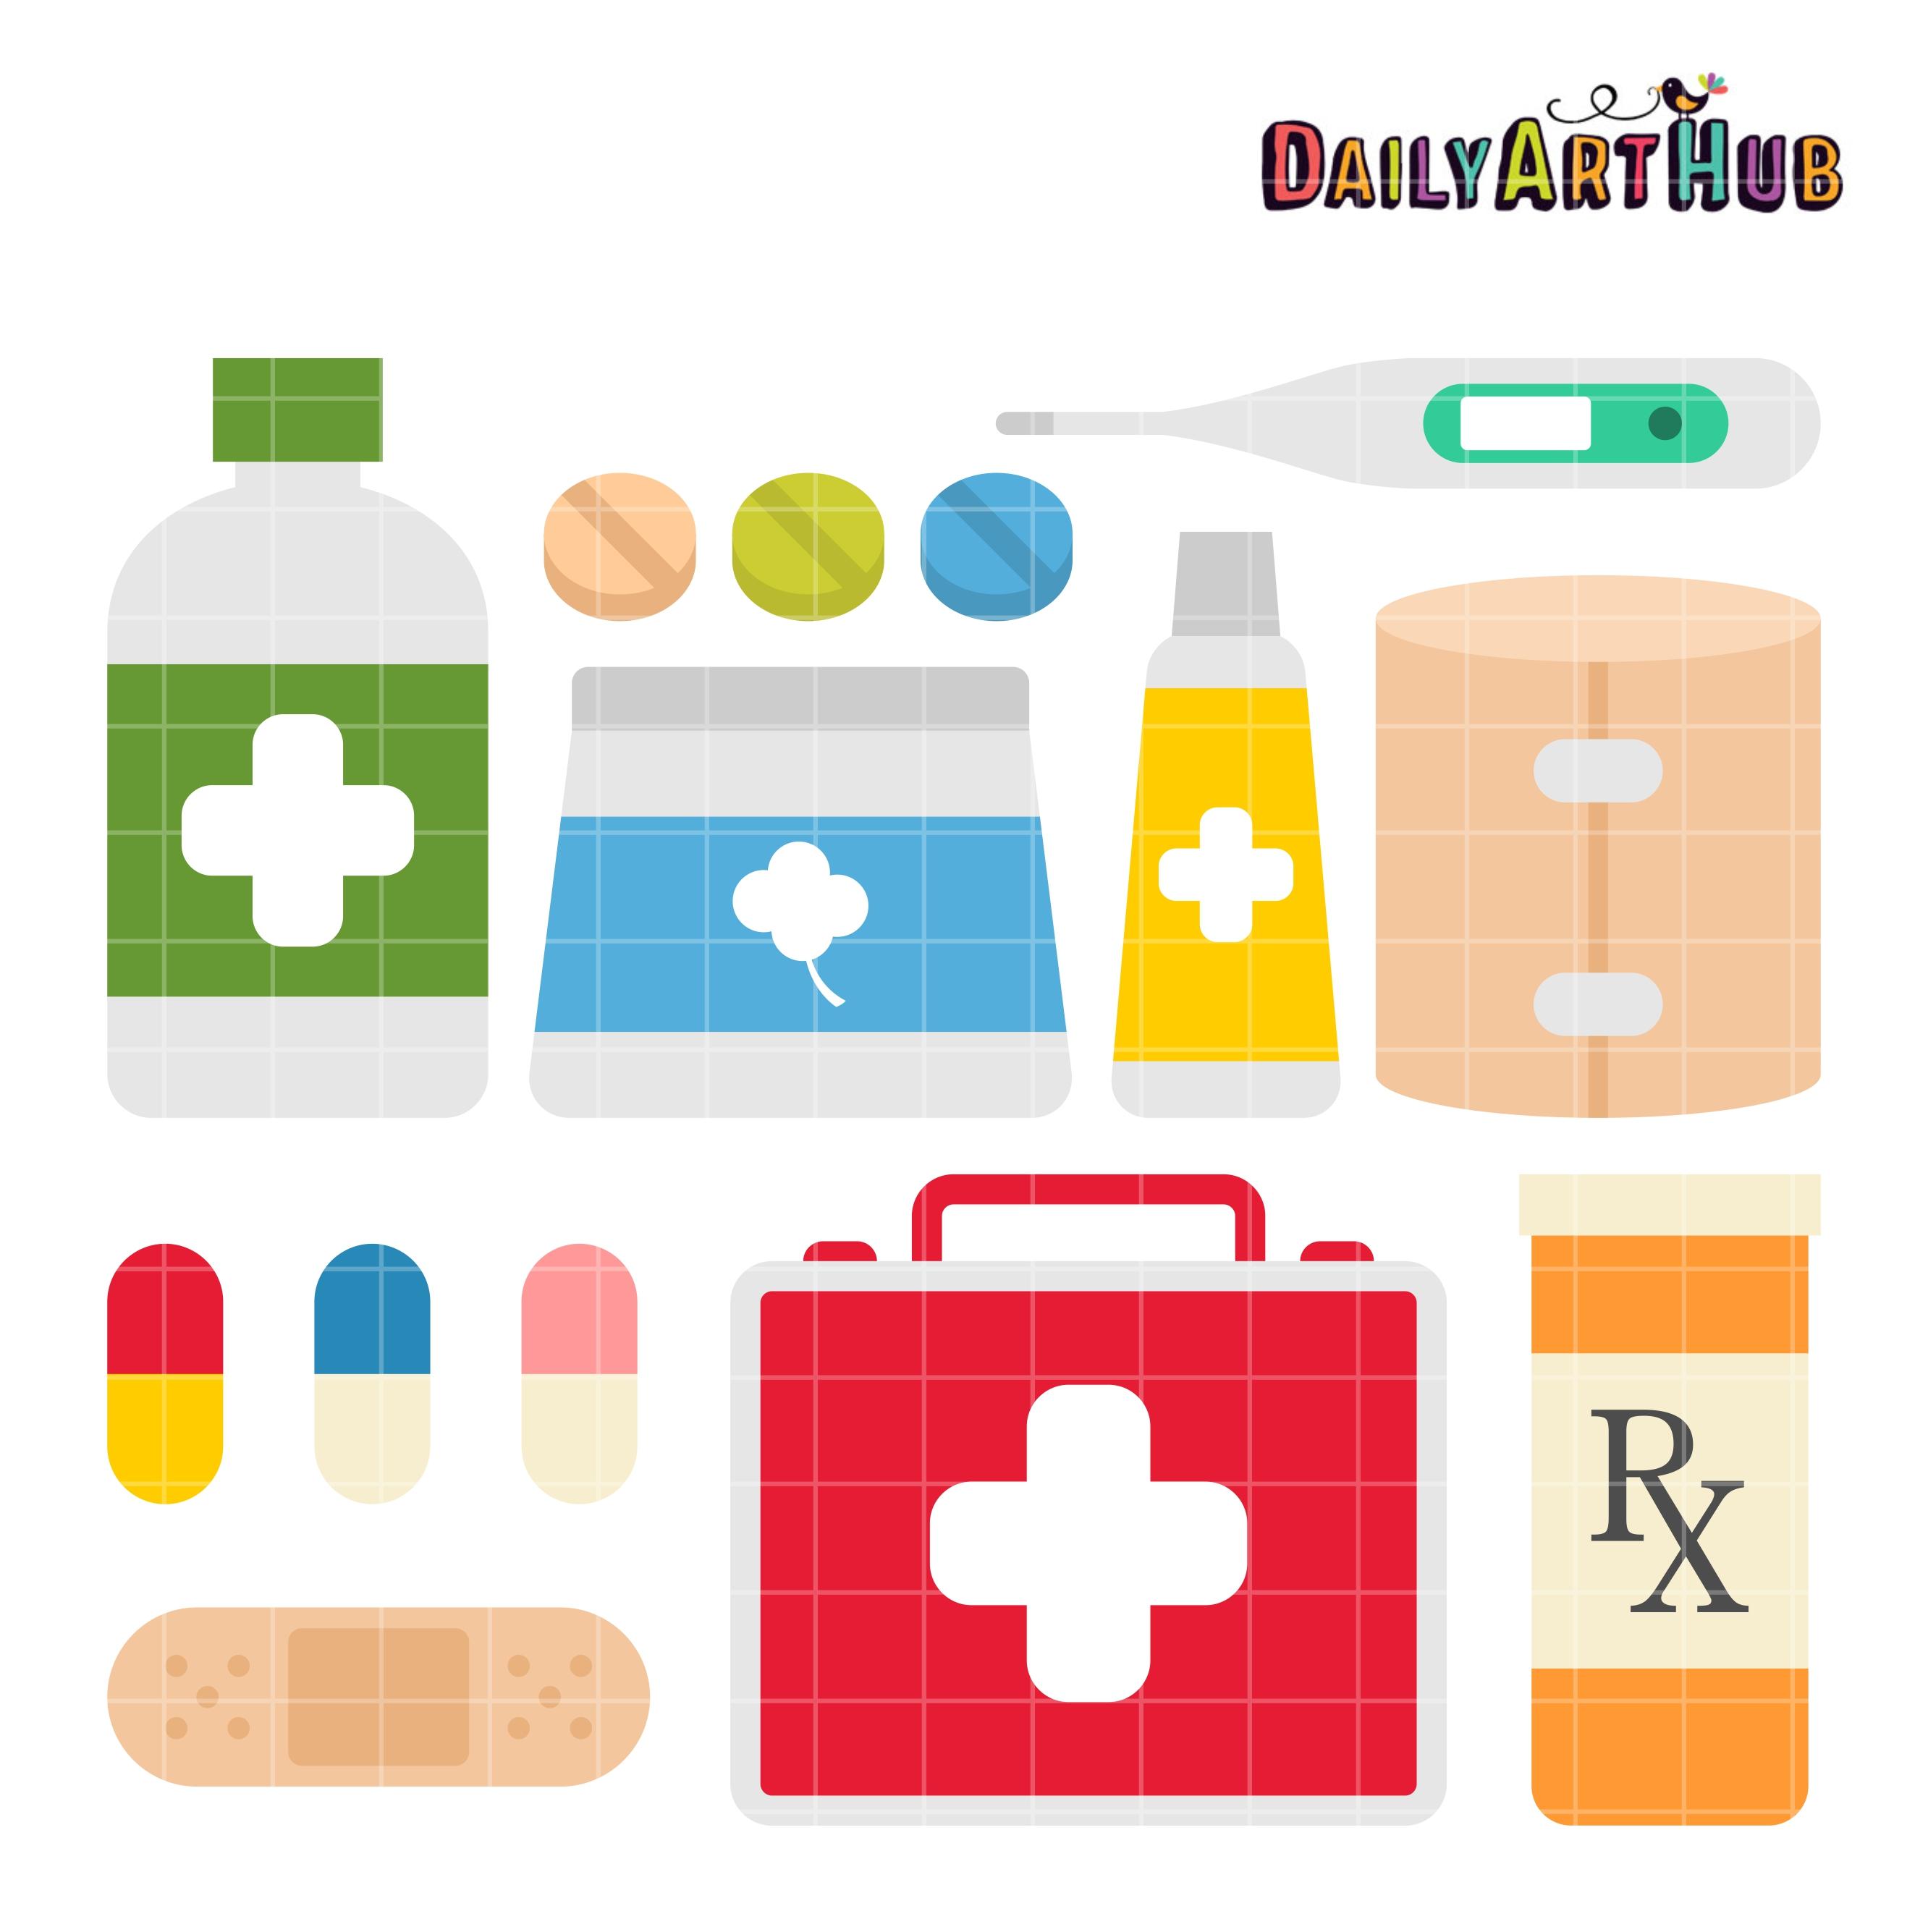 First Aid Kit Clip Art Set Daily Art Hub Free Clip Art